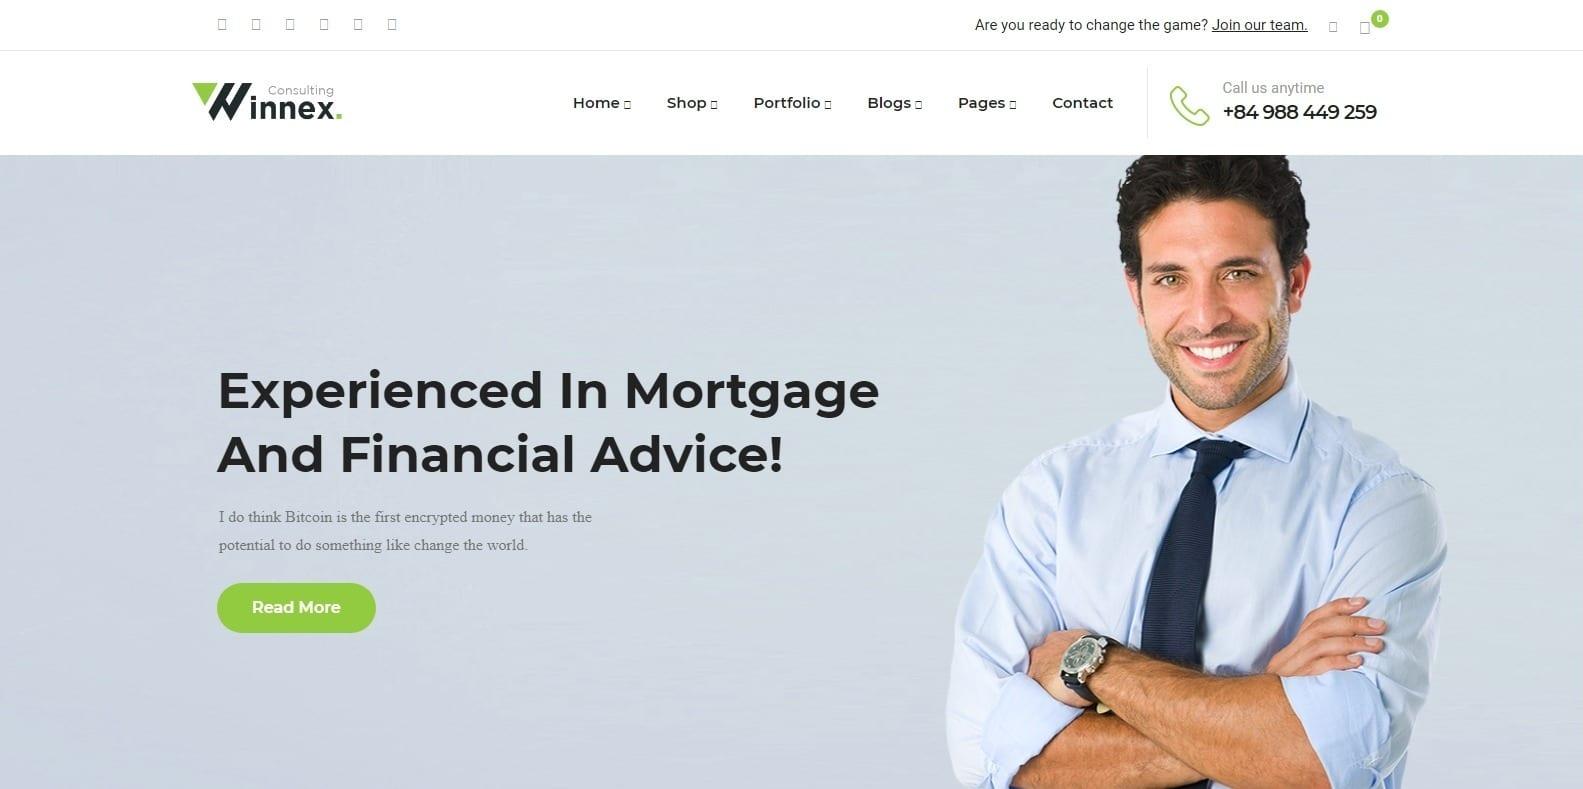 winnex-accounting-website-template